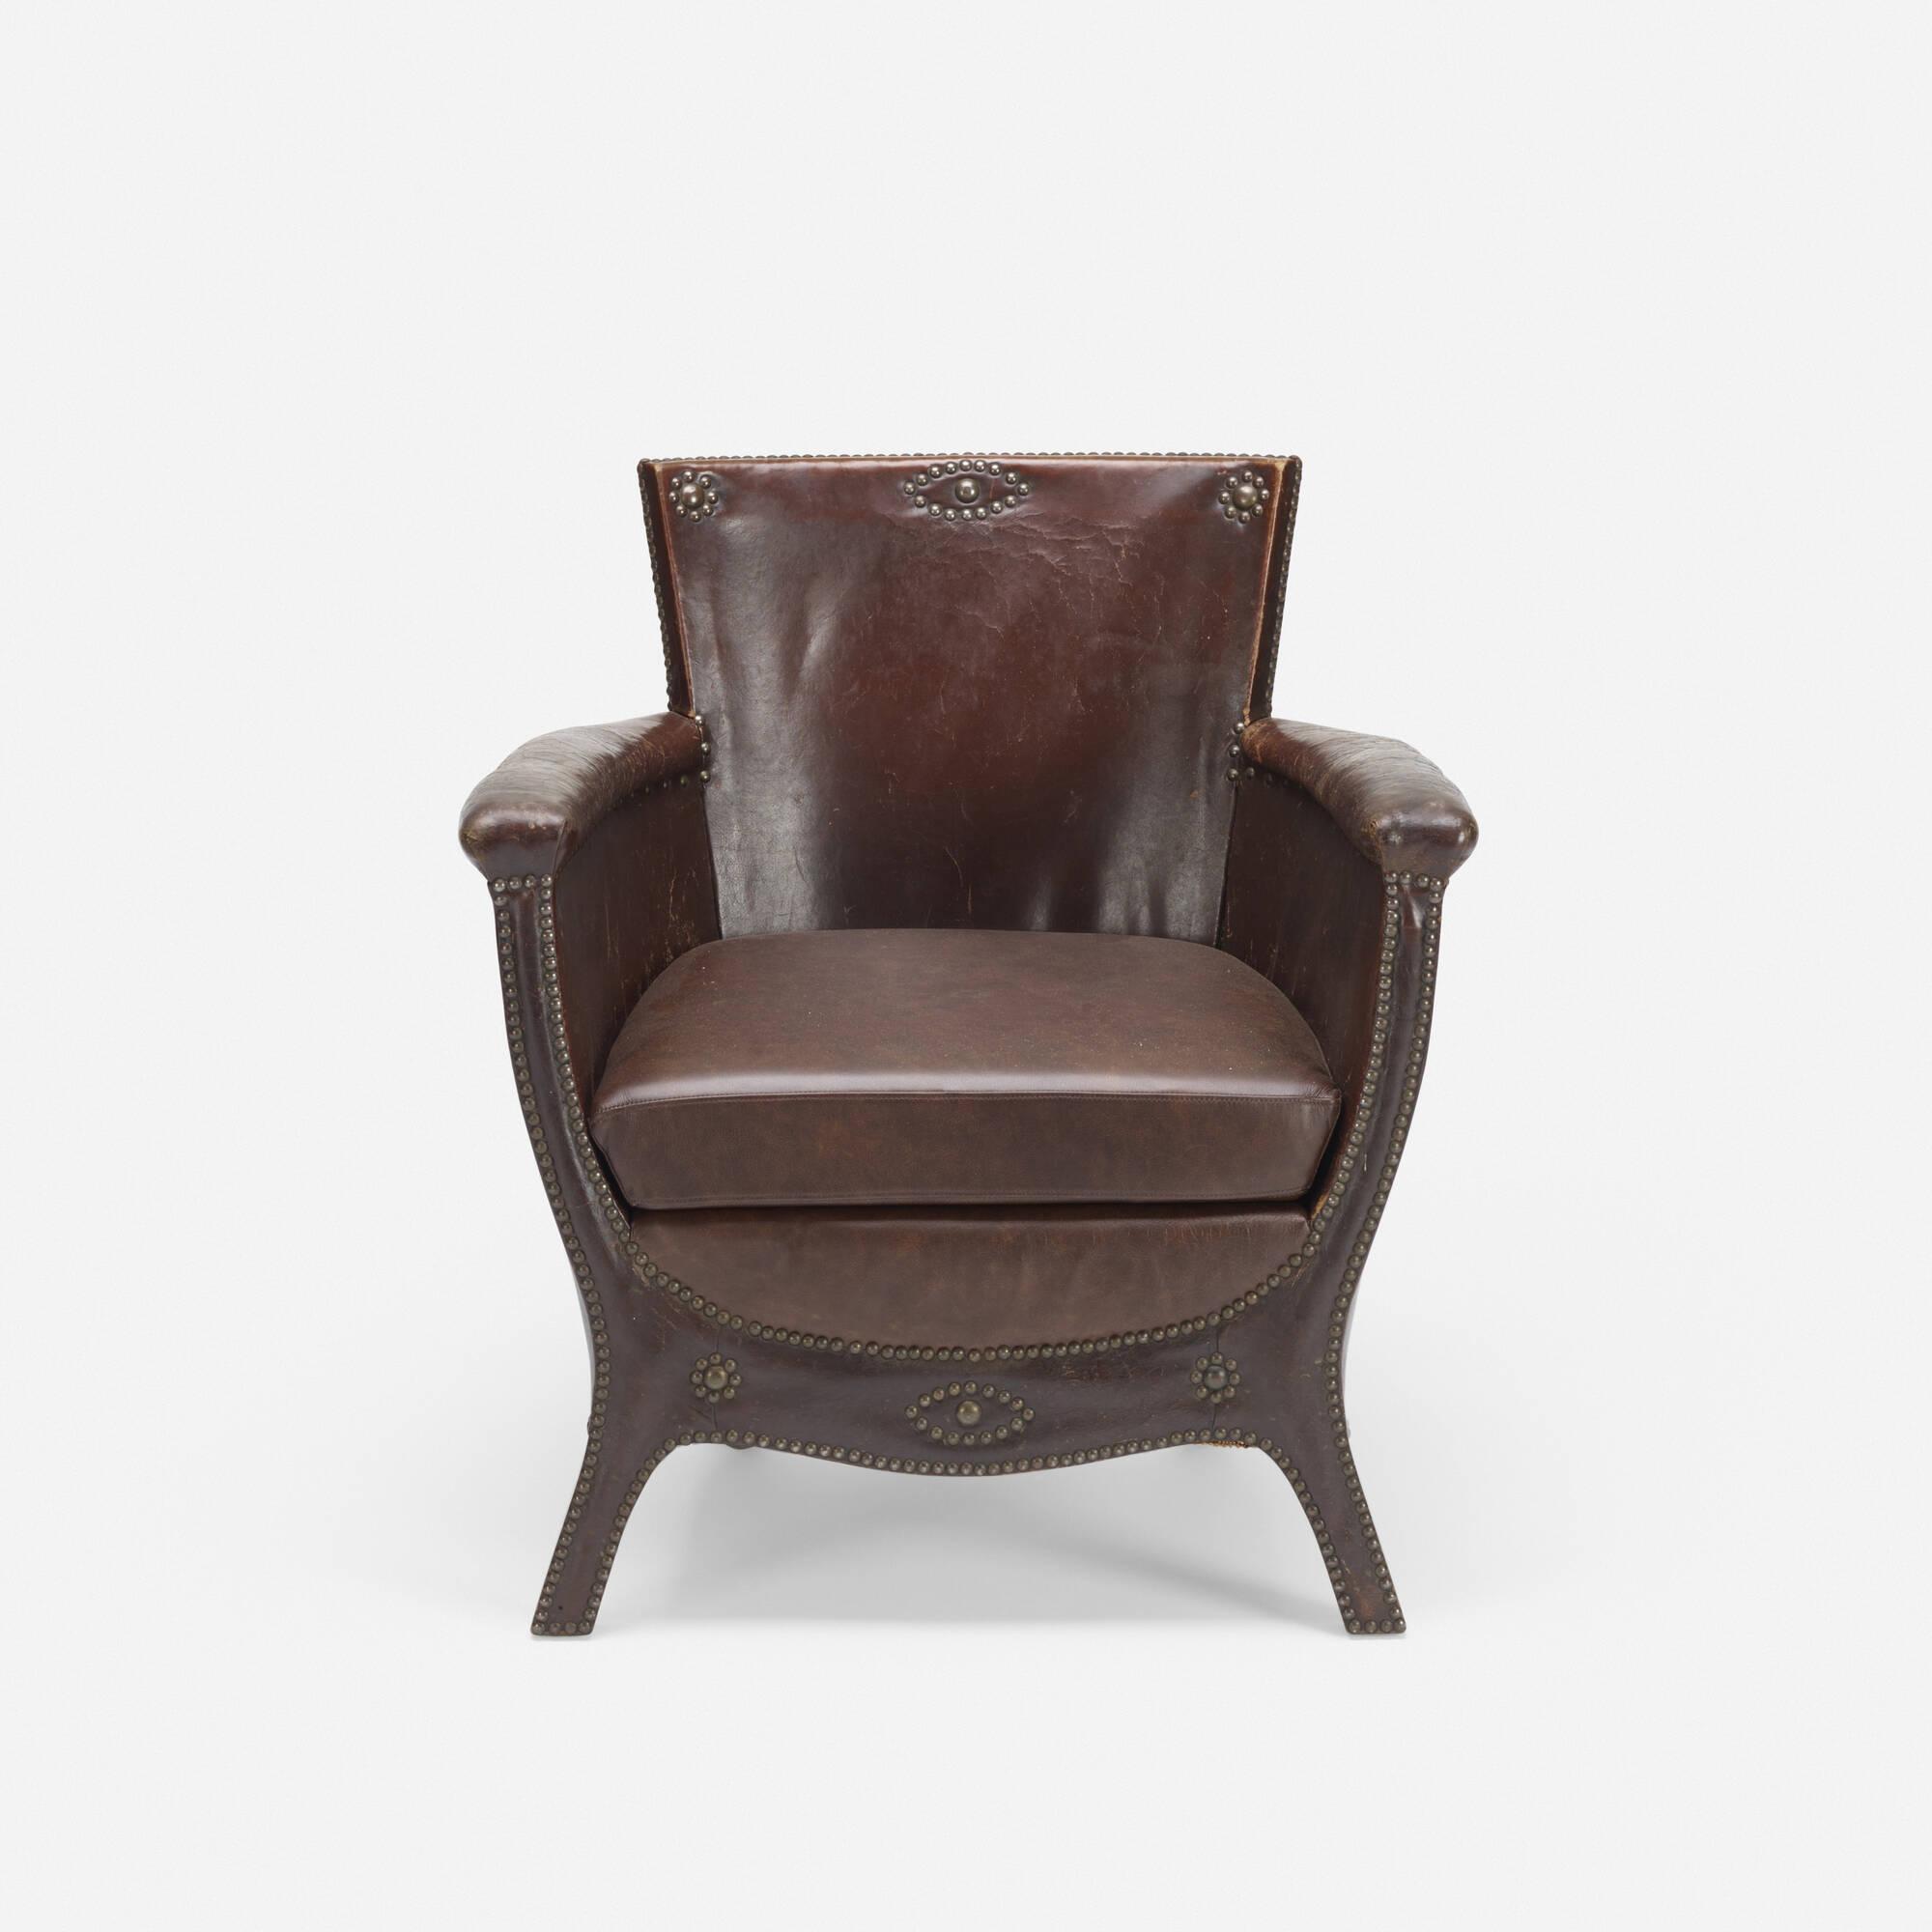 719: Otto Schulz / armchair (2 of 2)